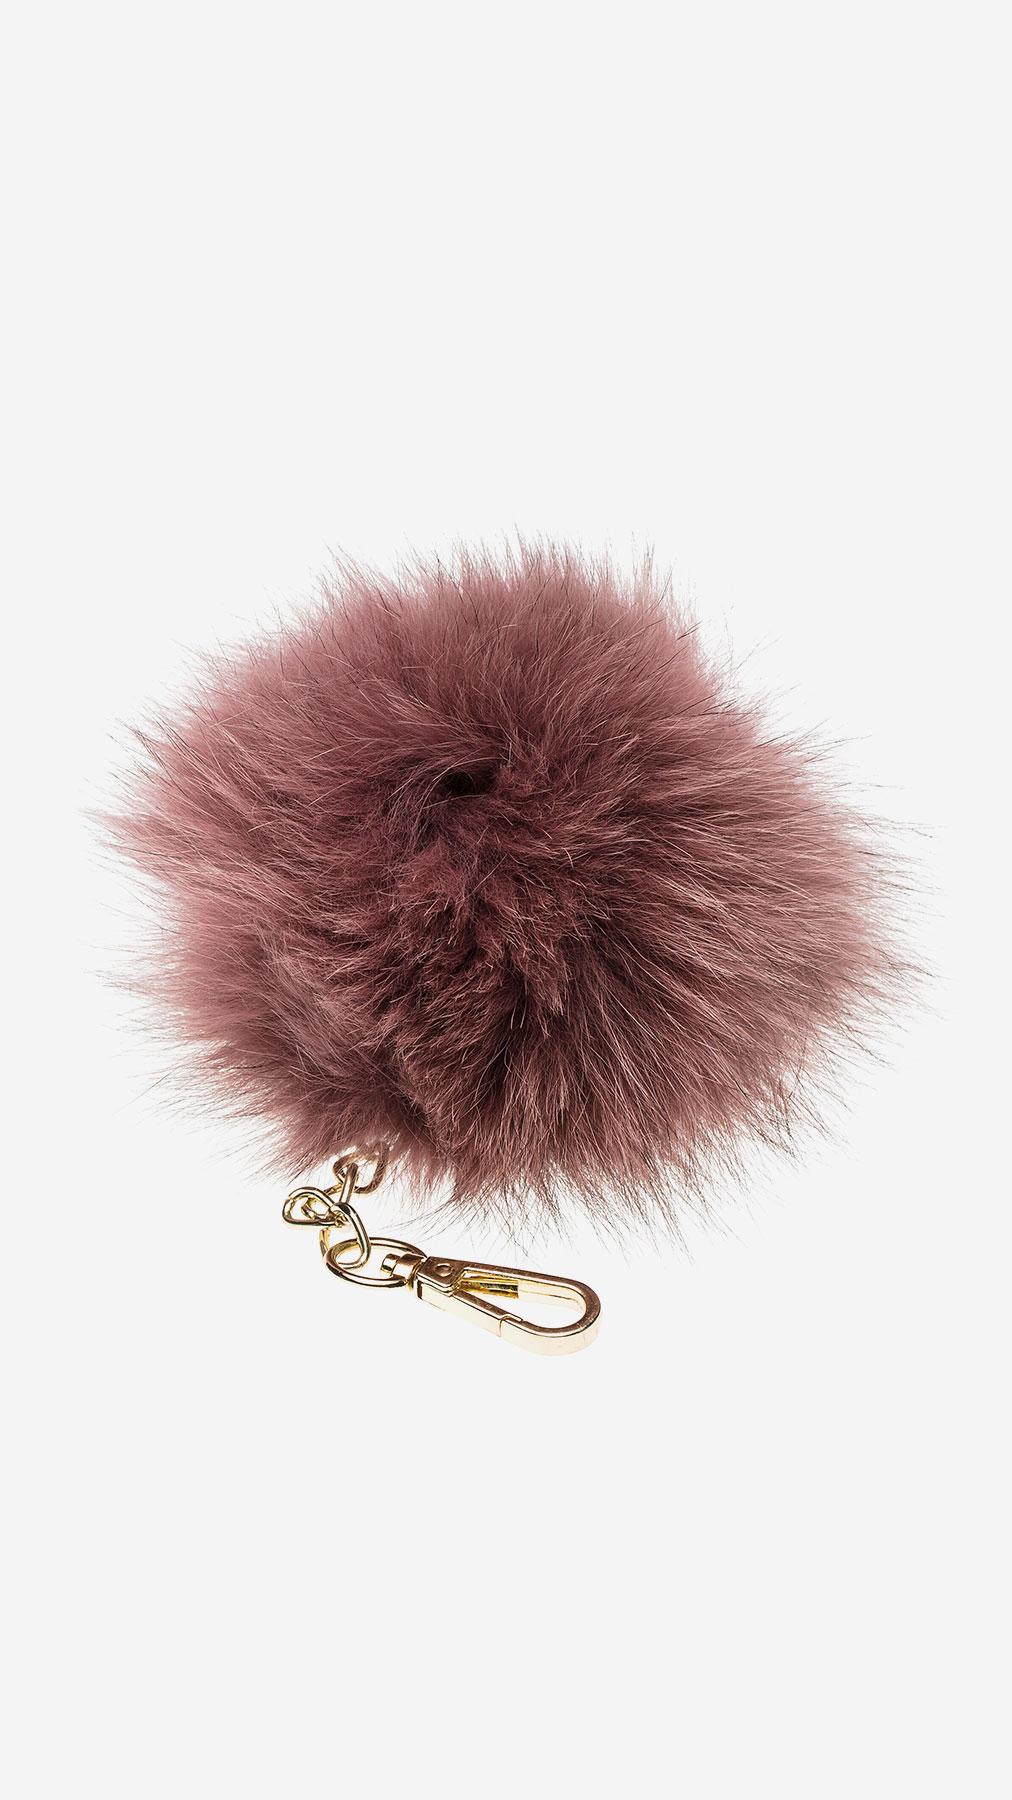 d7f7c1a26f FOX POM POM - Muse Furs